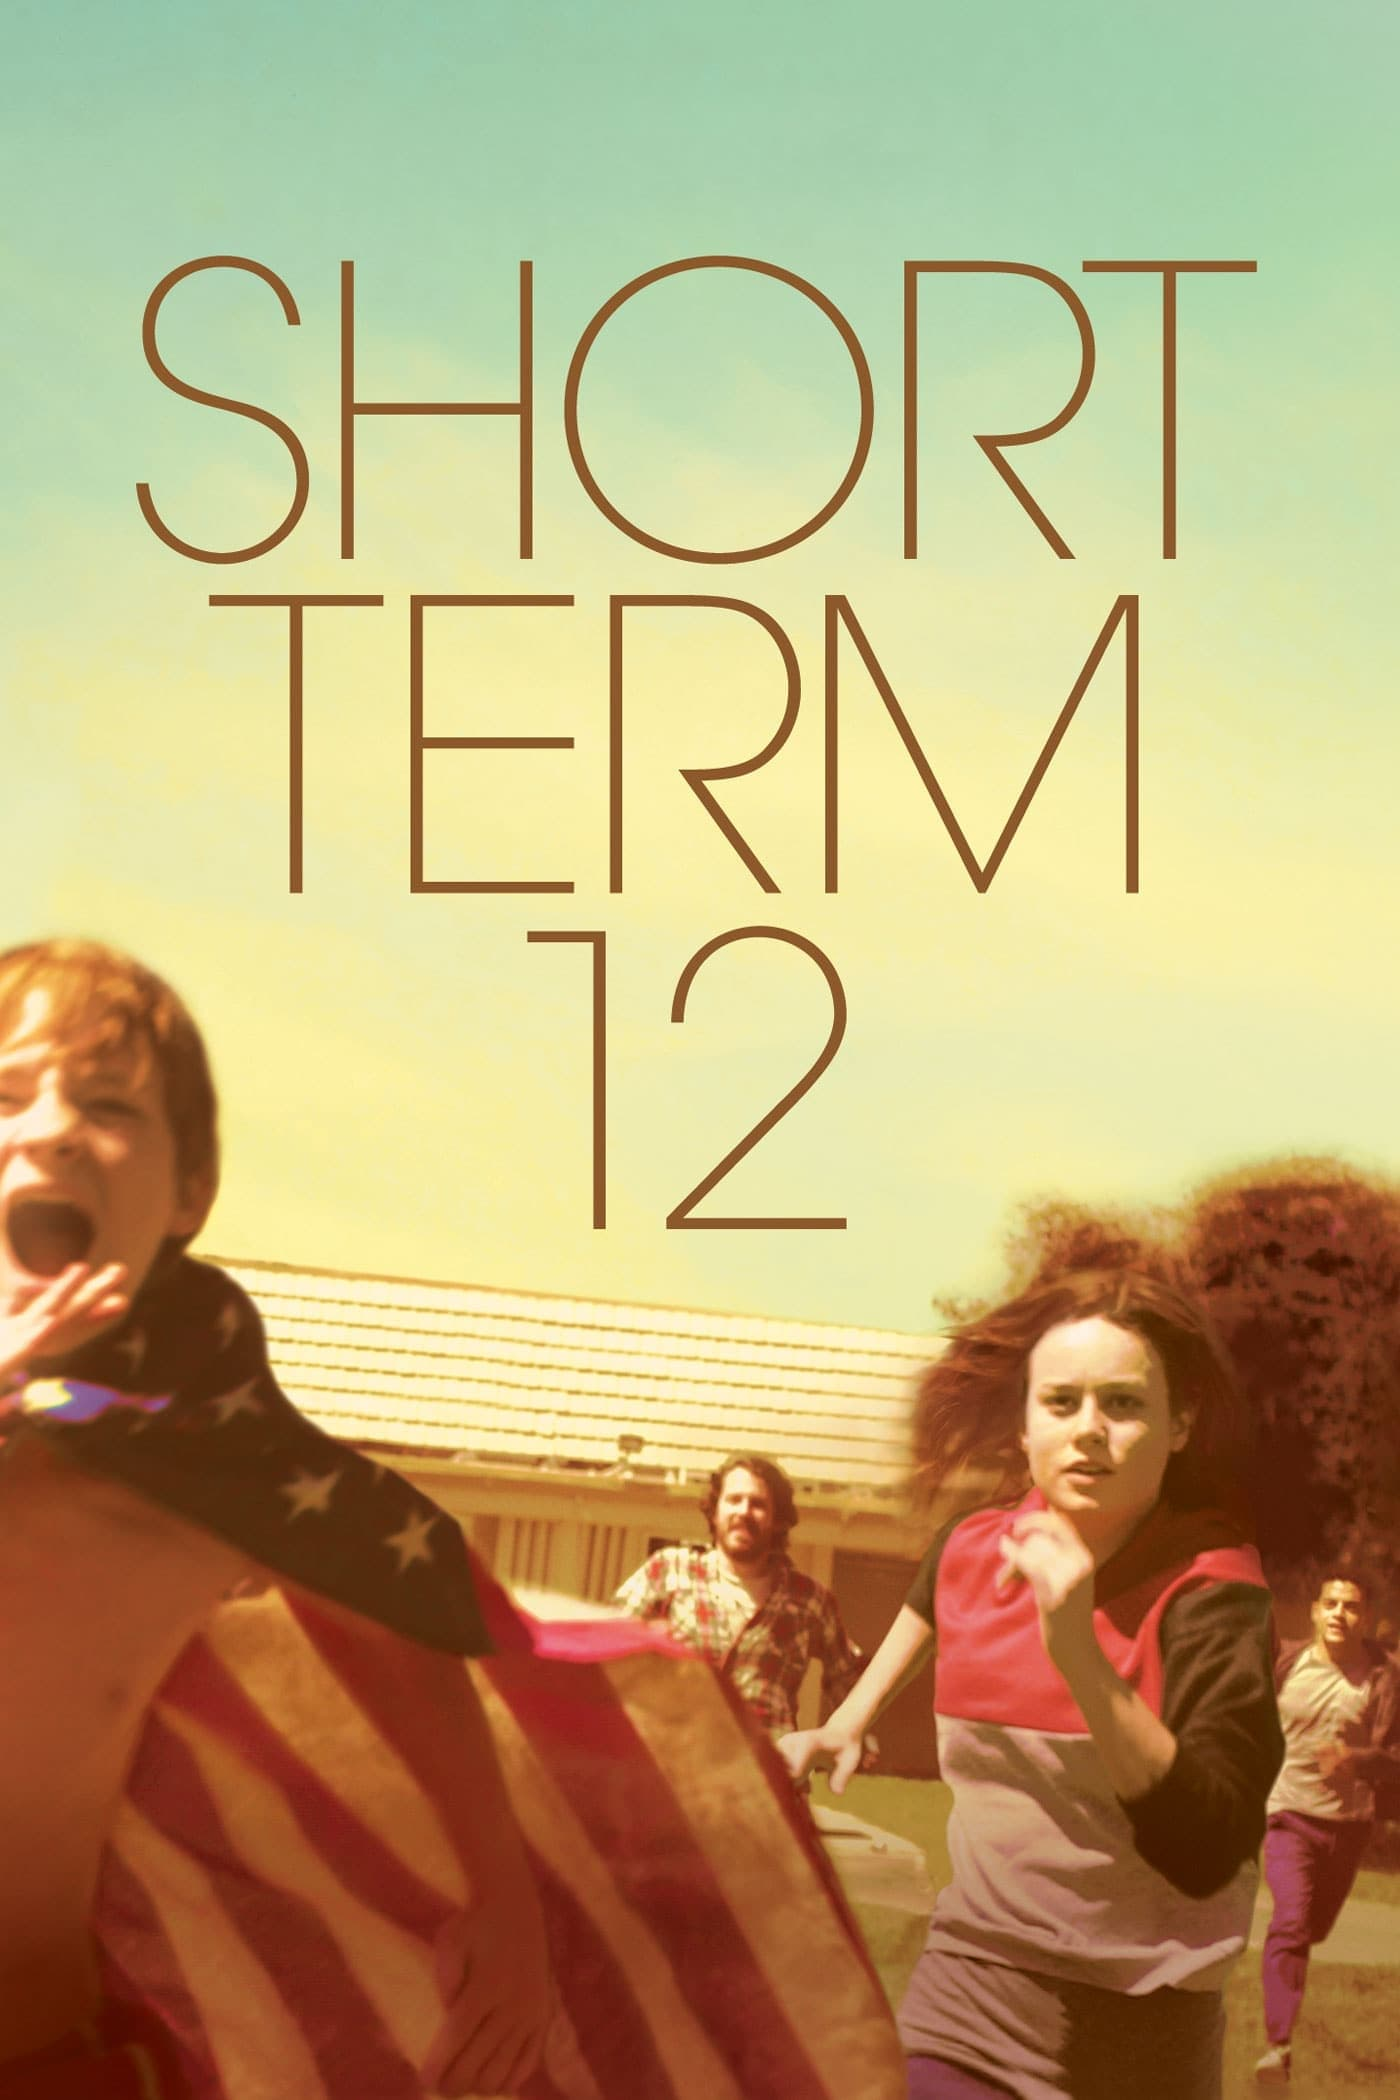 Short Term 12 Movie Streaming Online Watch on Amazon, Tubi